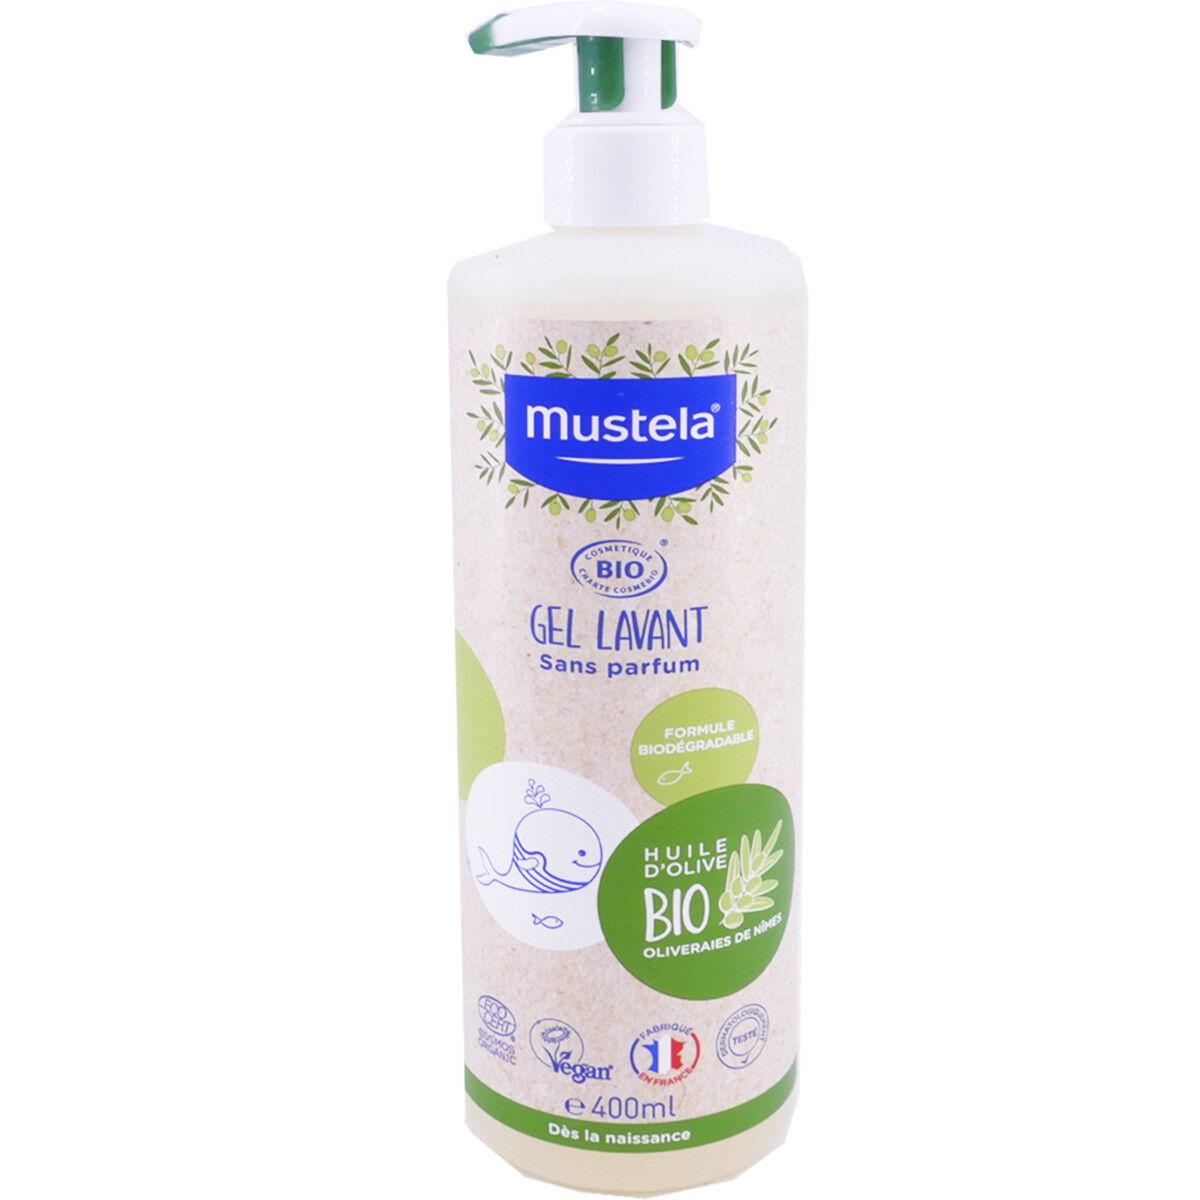 Mustela gel lavant bio 400 ml